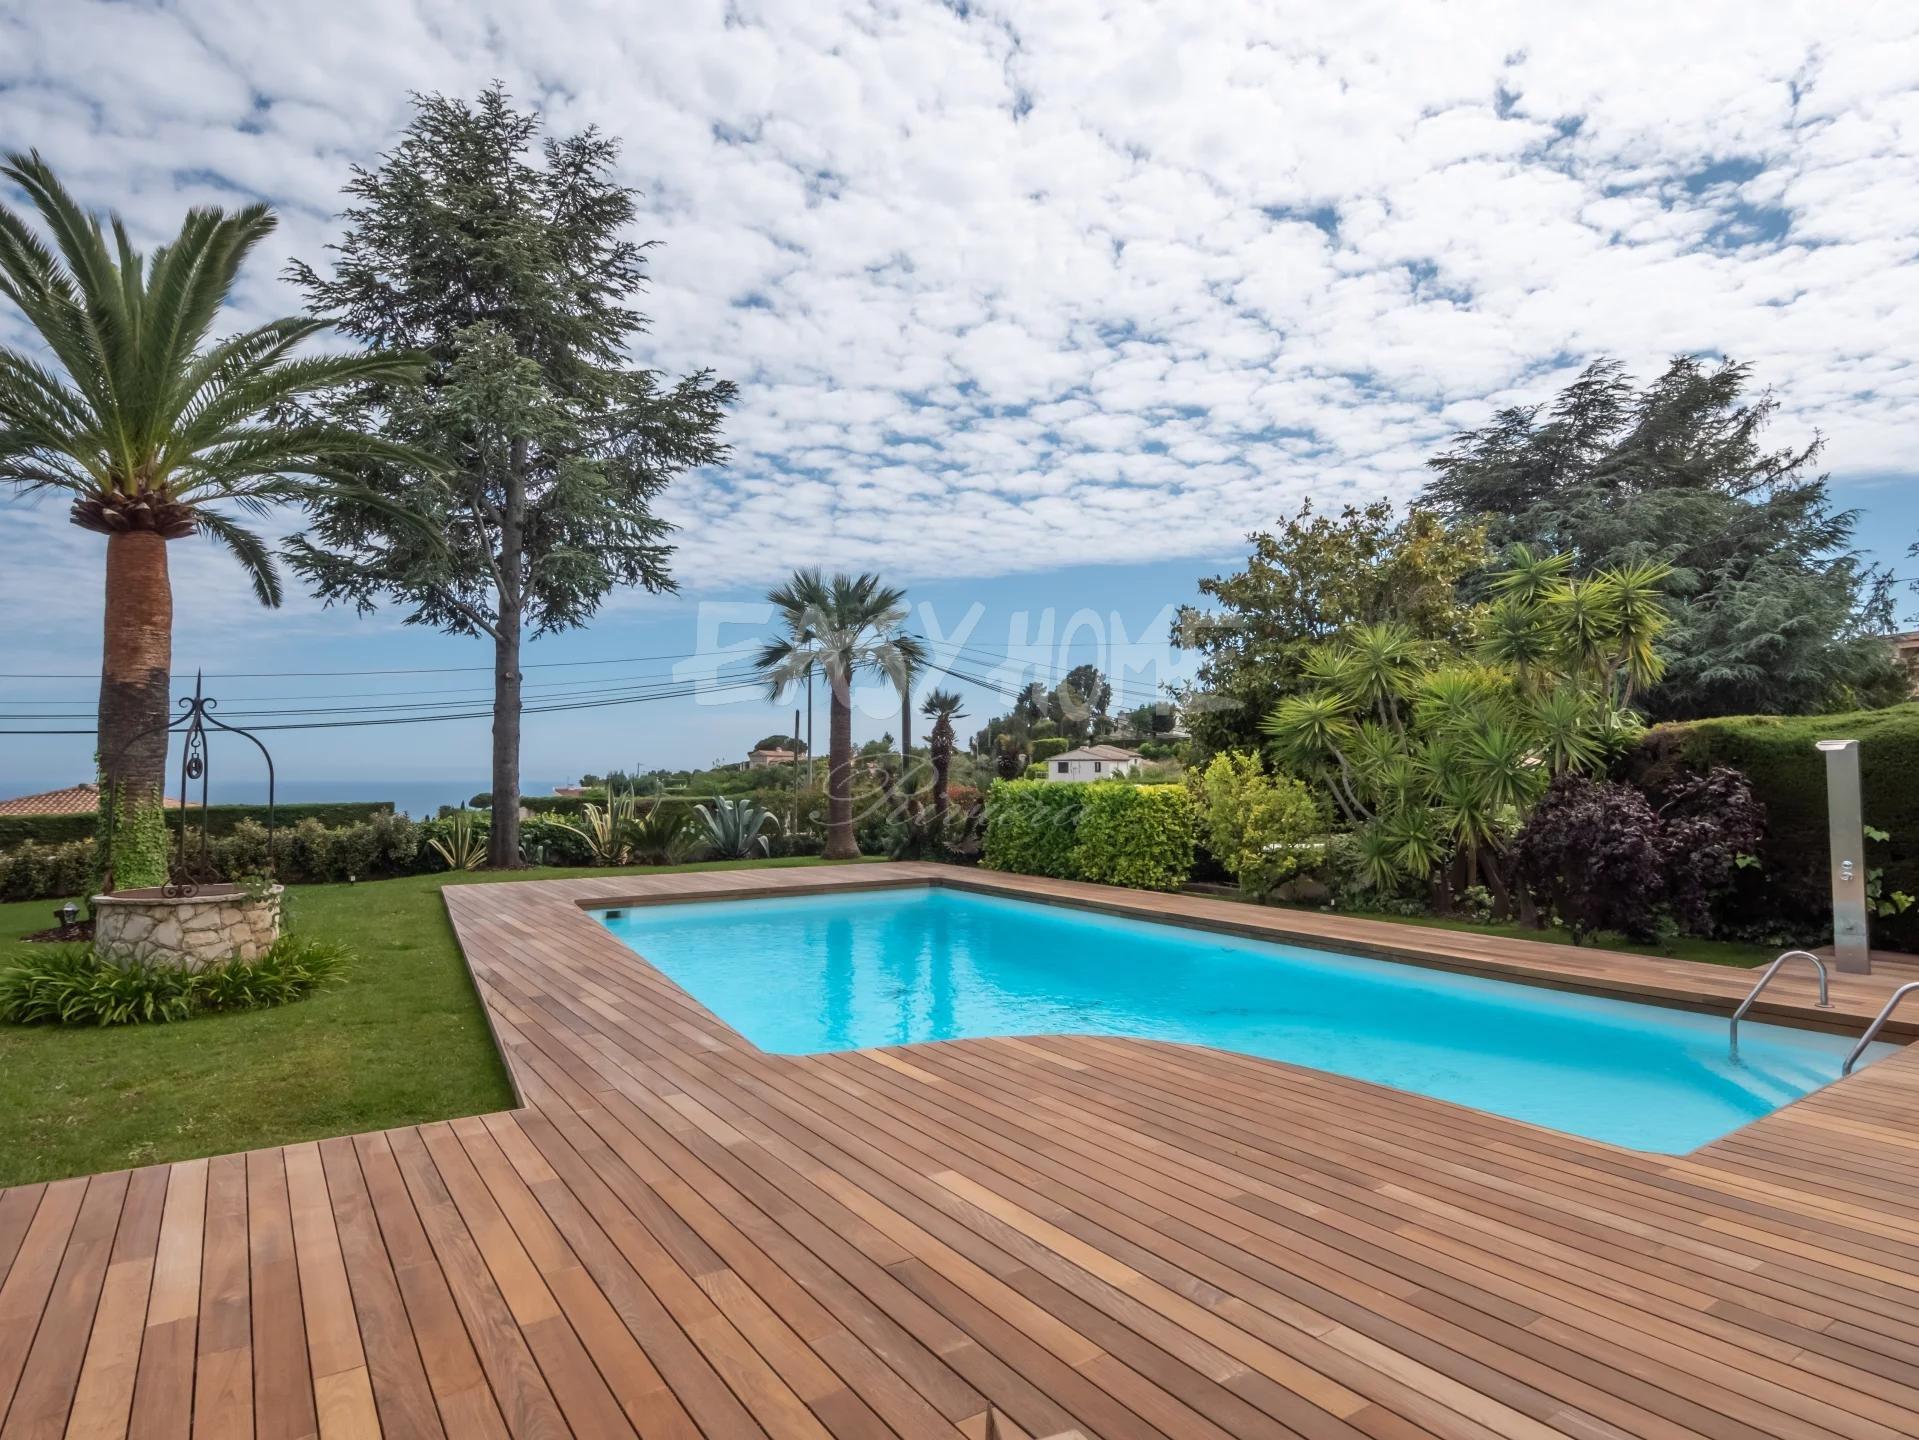 Купля / продажа вилла супер канны панорамный вид на море